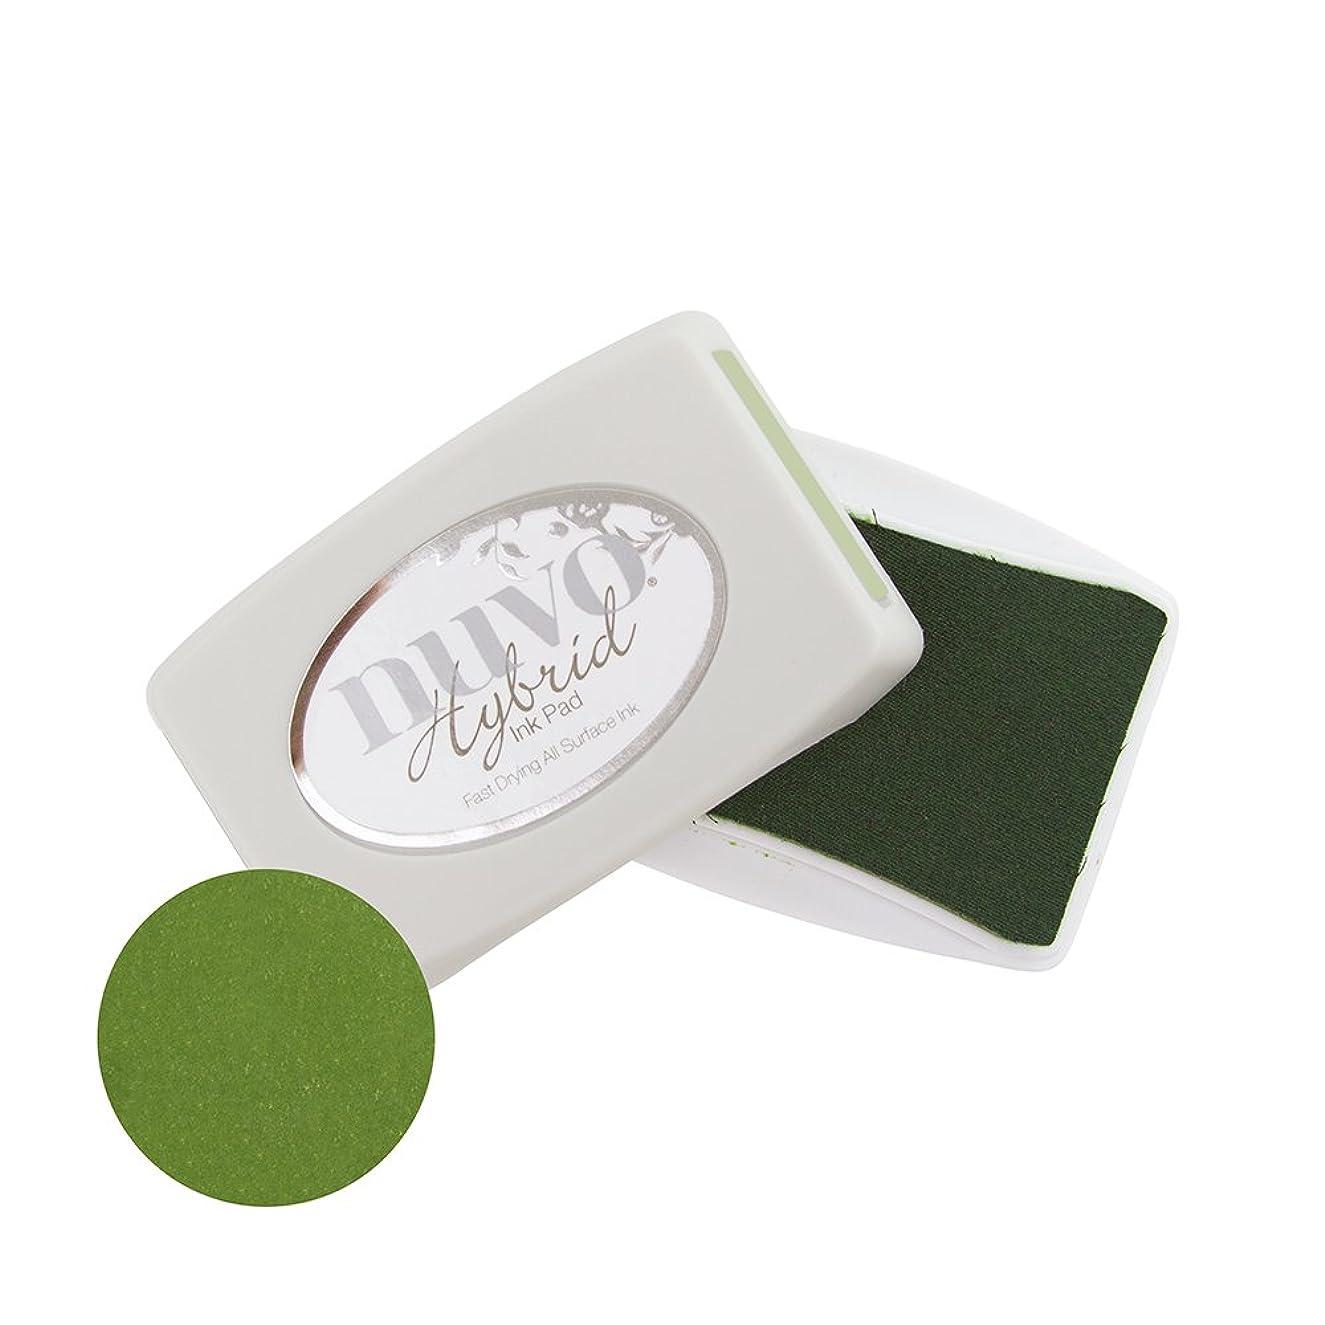 TONIC STUDIOS Green Safari GRN-NUVO Ink PAD